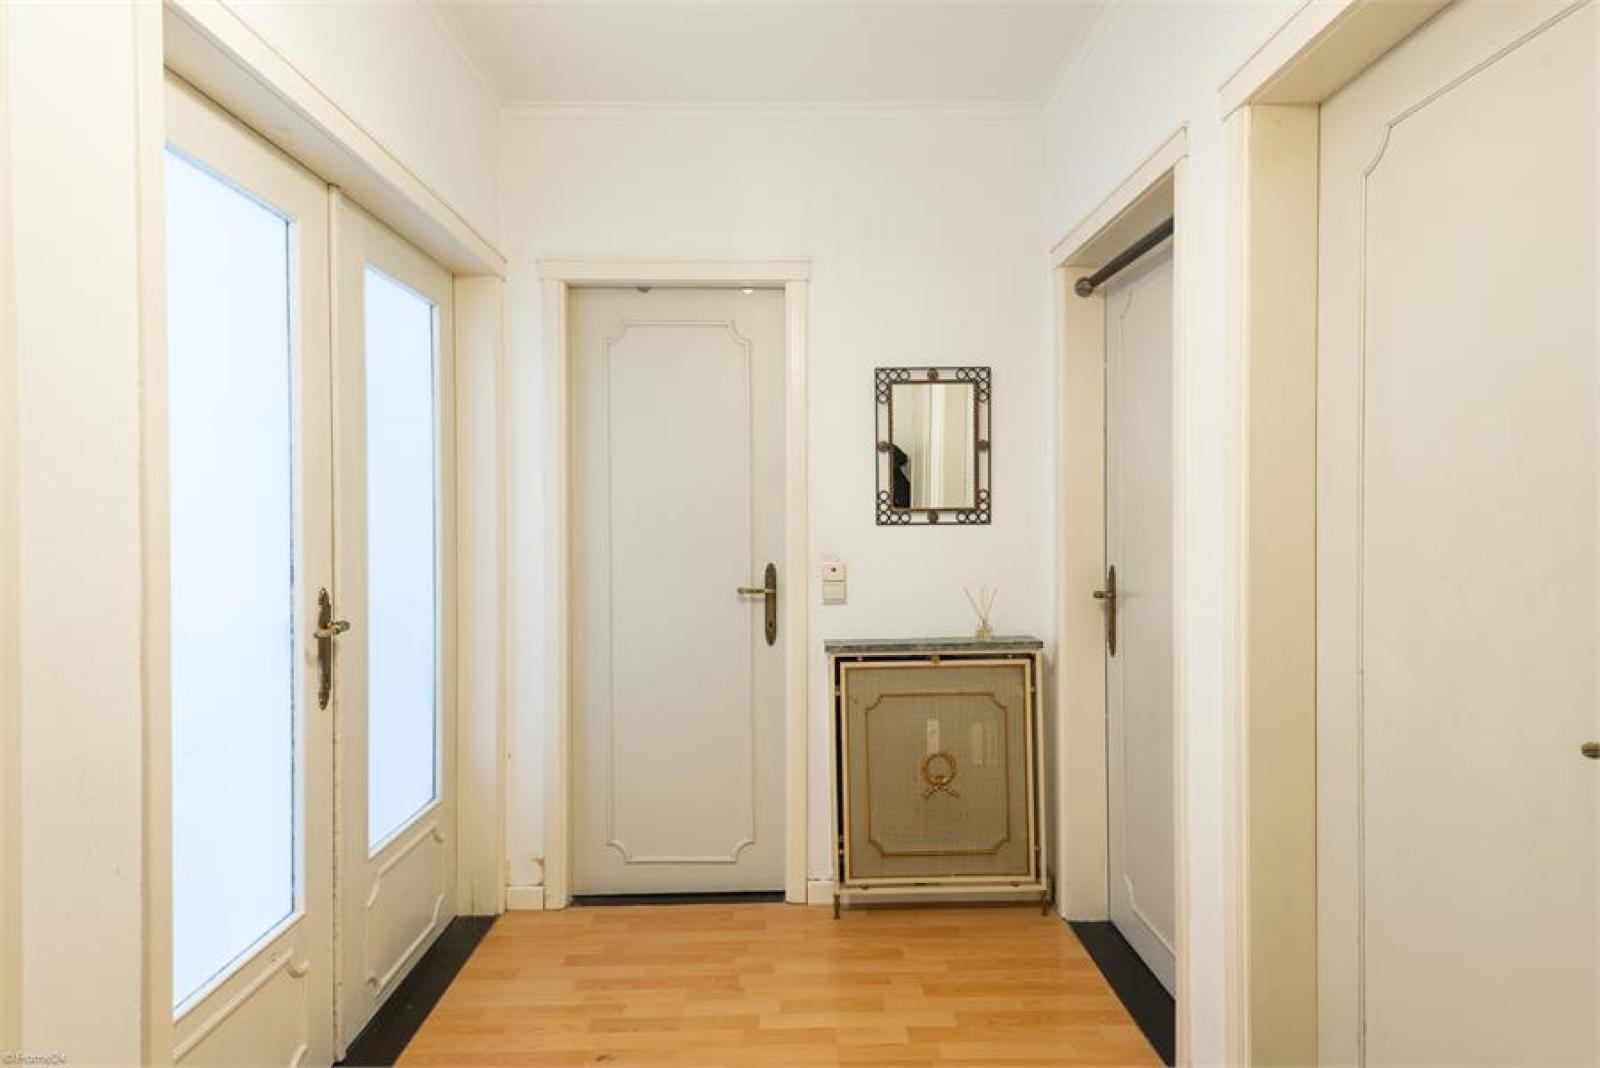 Instapklaar appartement (77 m²) met twee slaapkamers op centrale ligging te Deurne! afbeelding 11